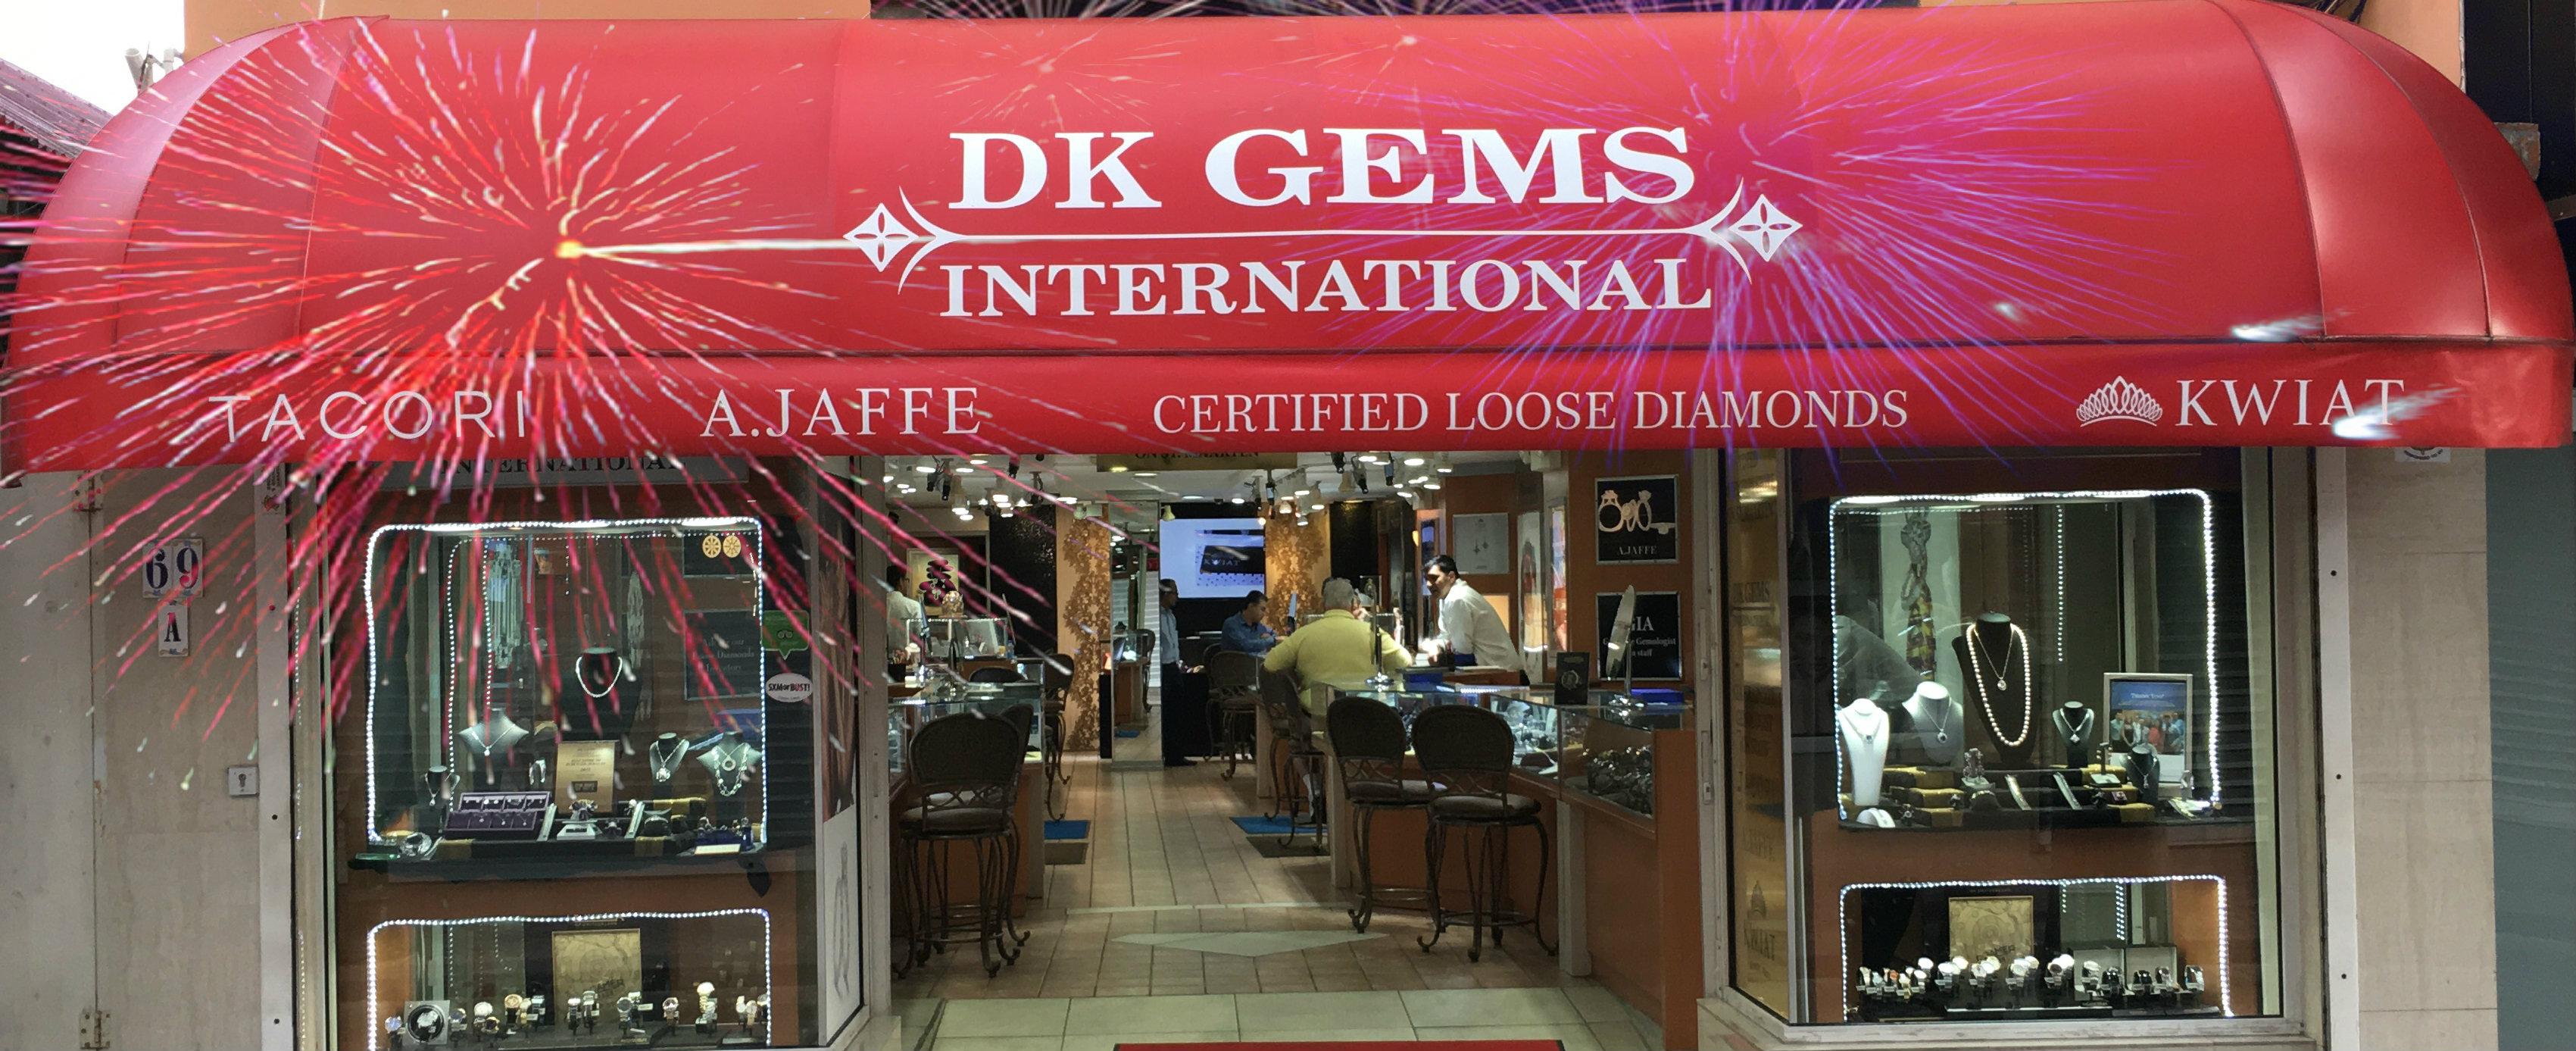 jewelry stores in st maarten DK Gems International VOTED BEST Sint Maarten Jewelry stores happy fireworks